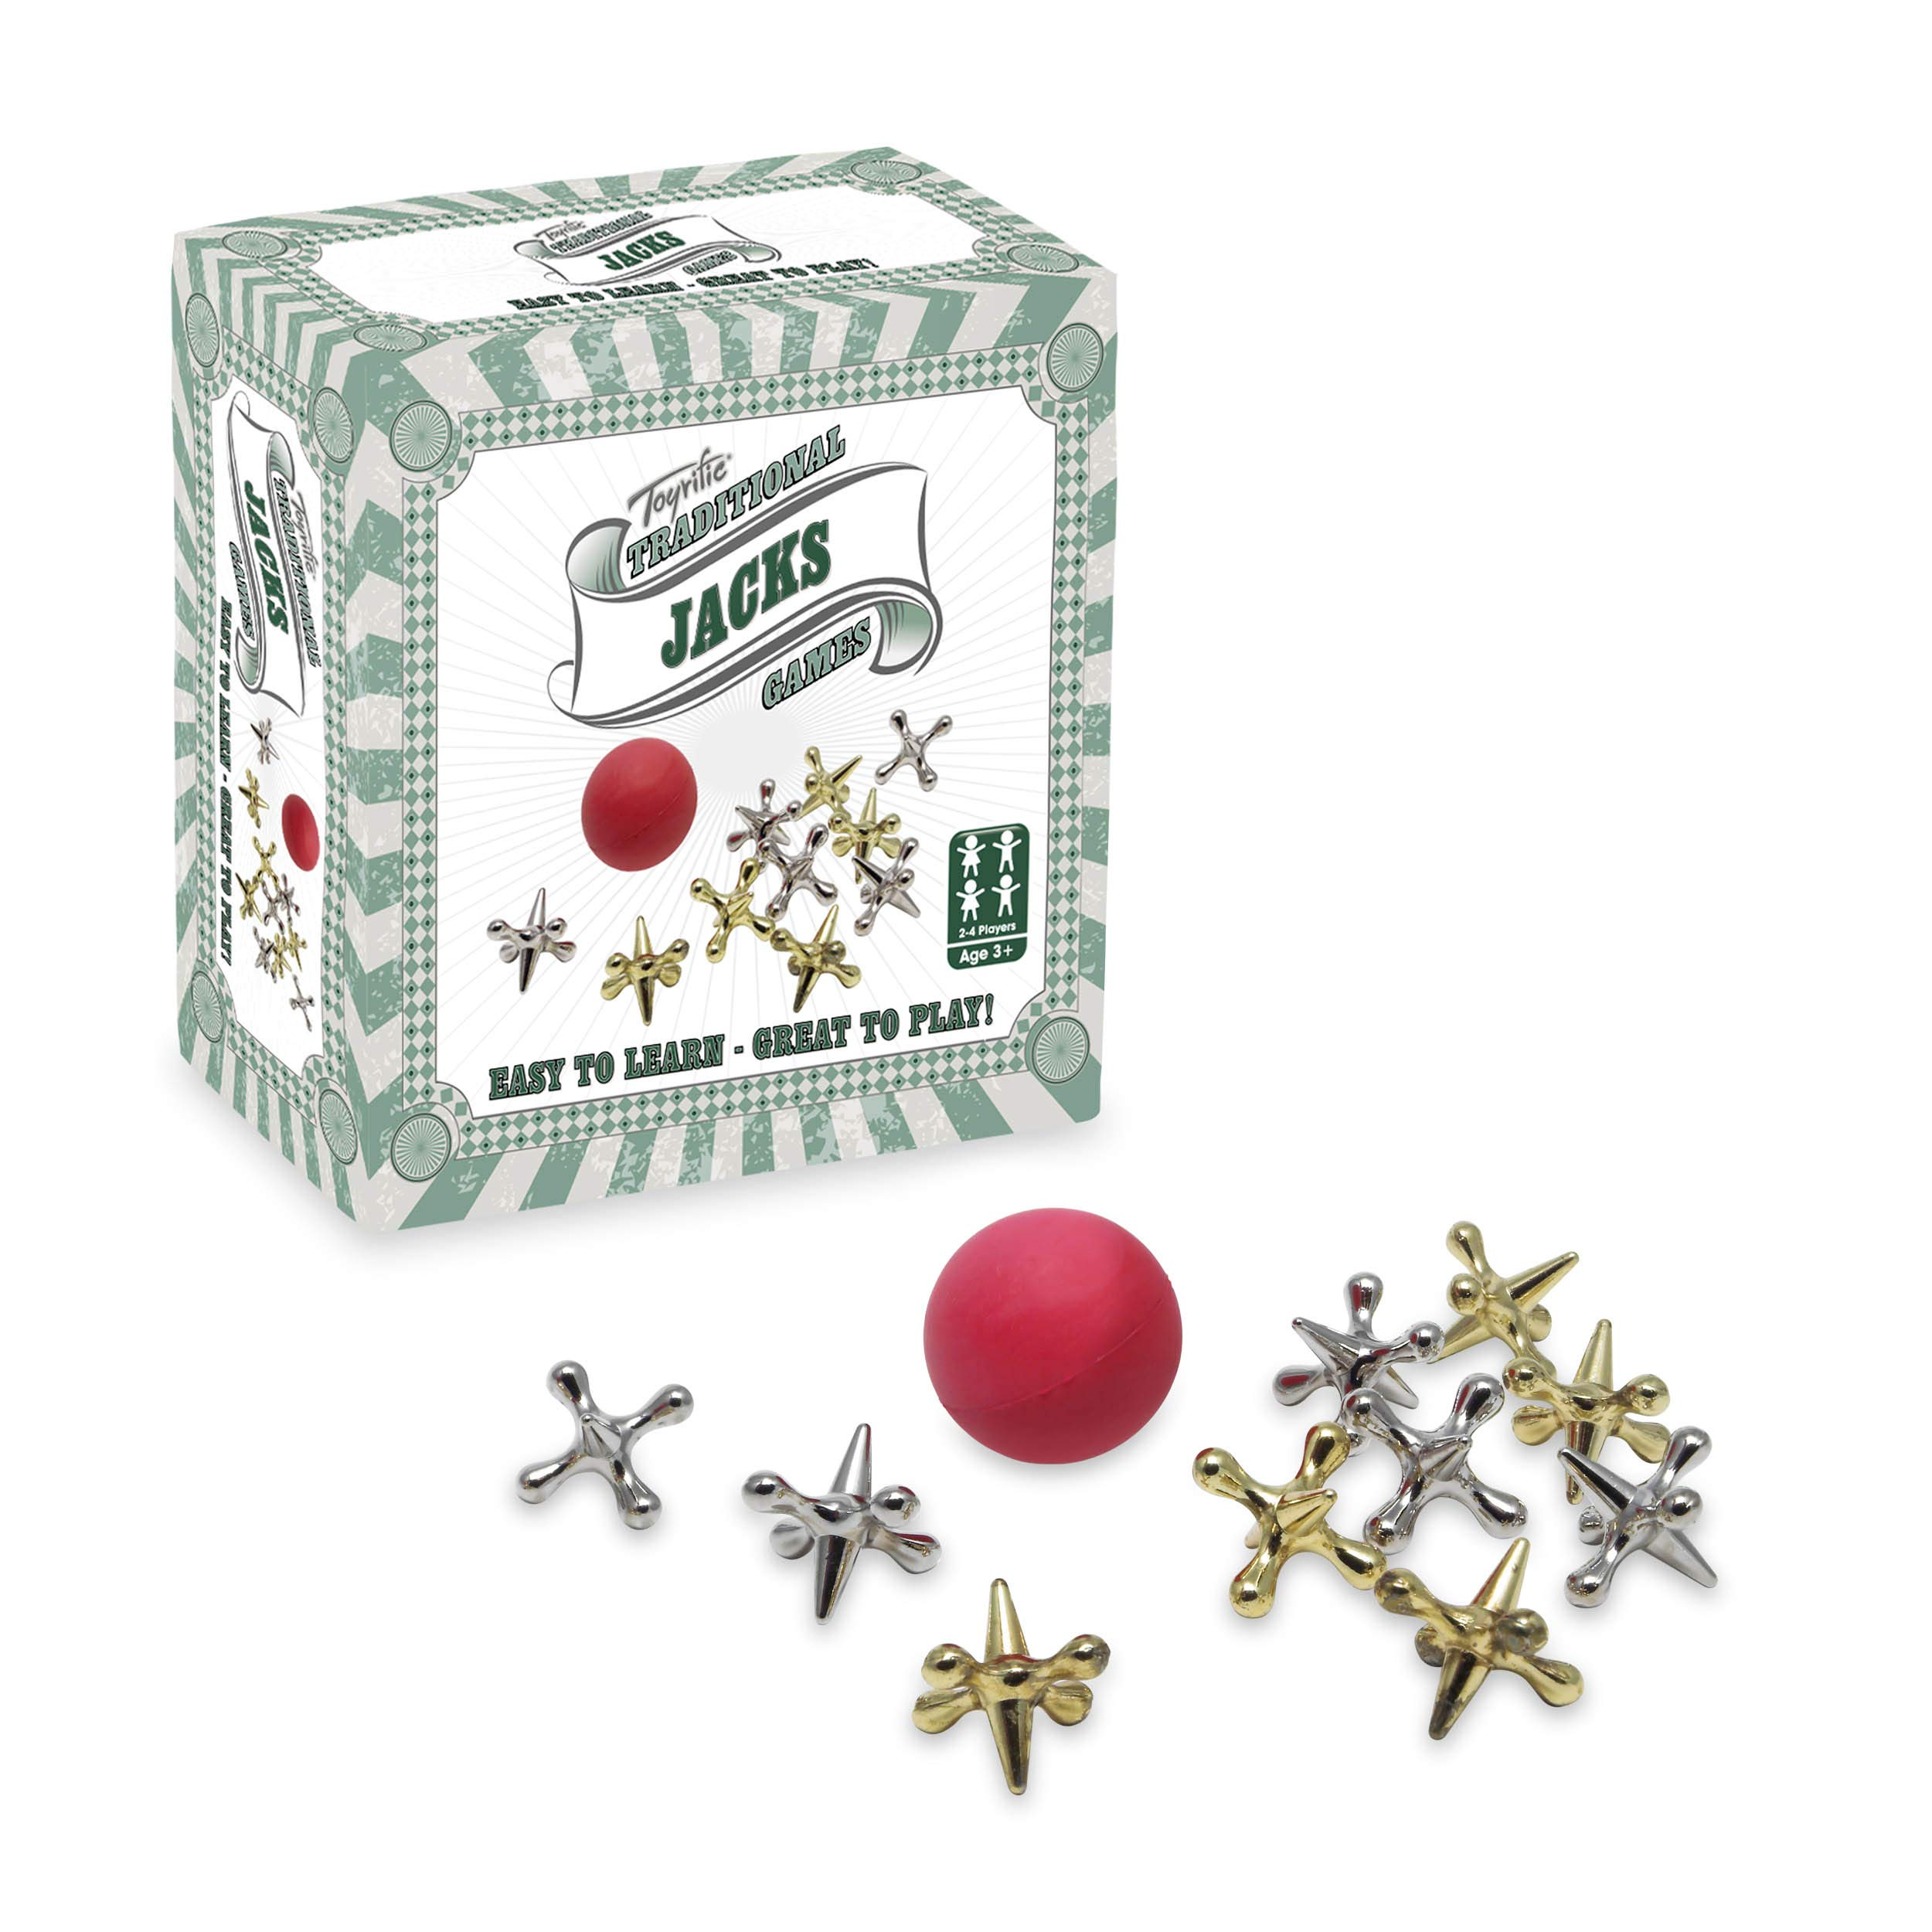 Toyrific Jacks Classic Kids Game Set - Individual Set